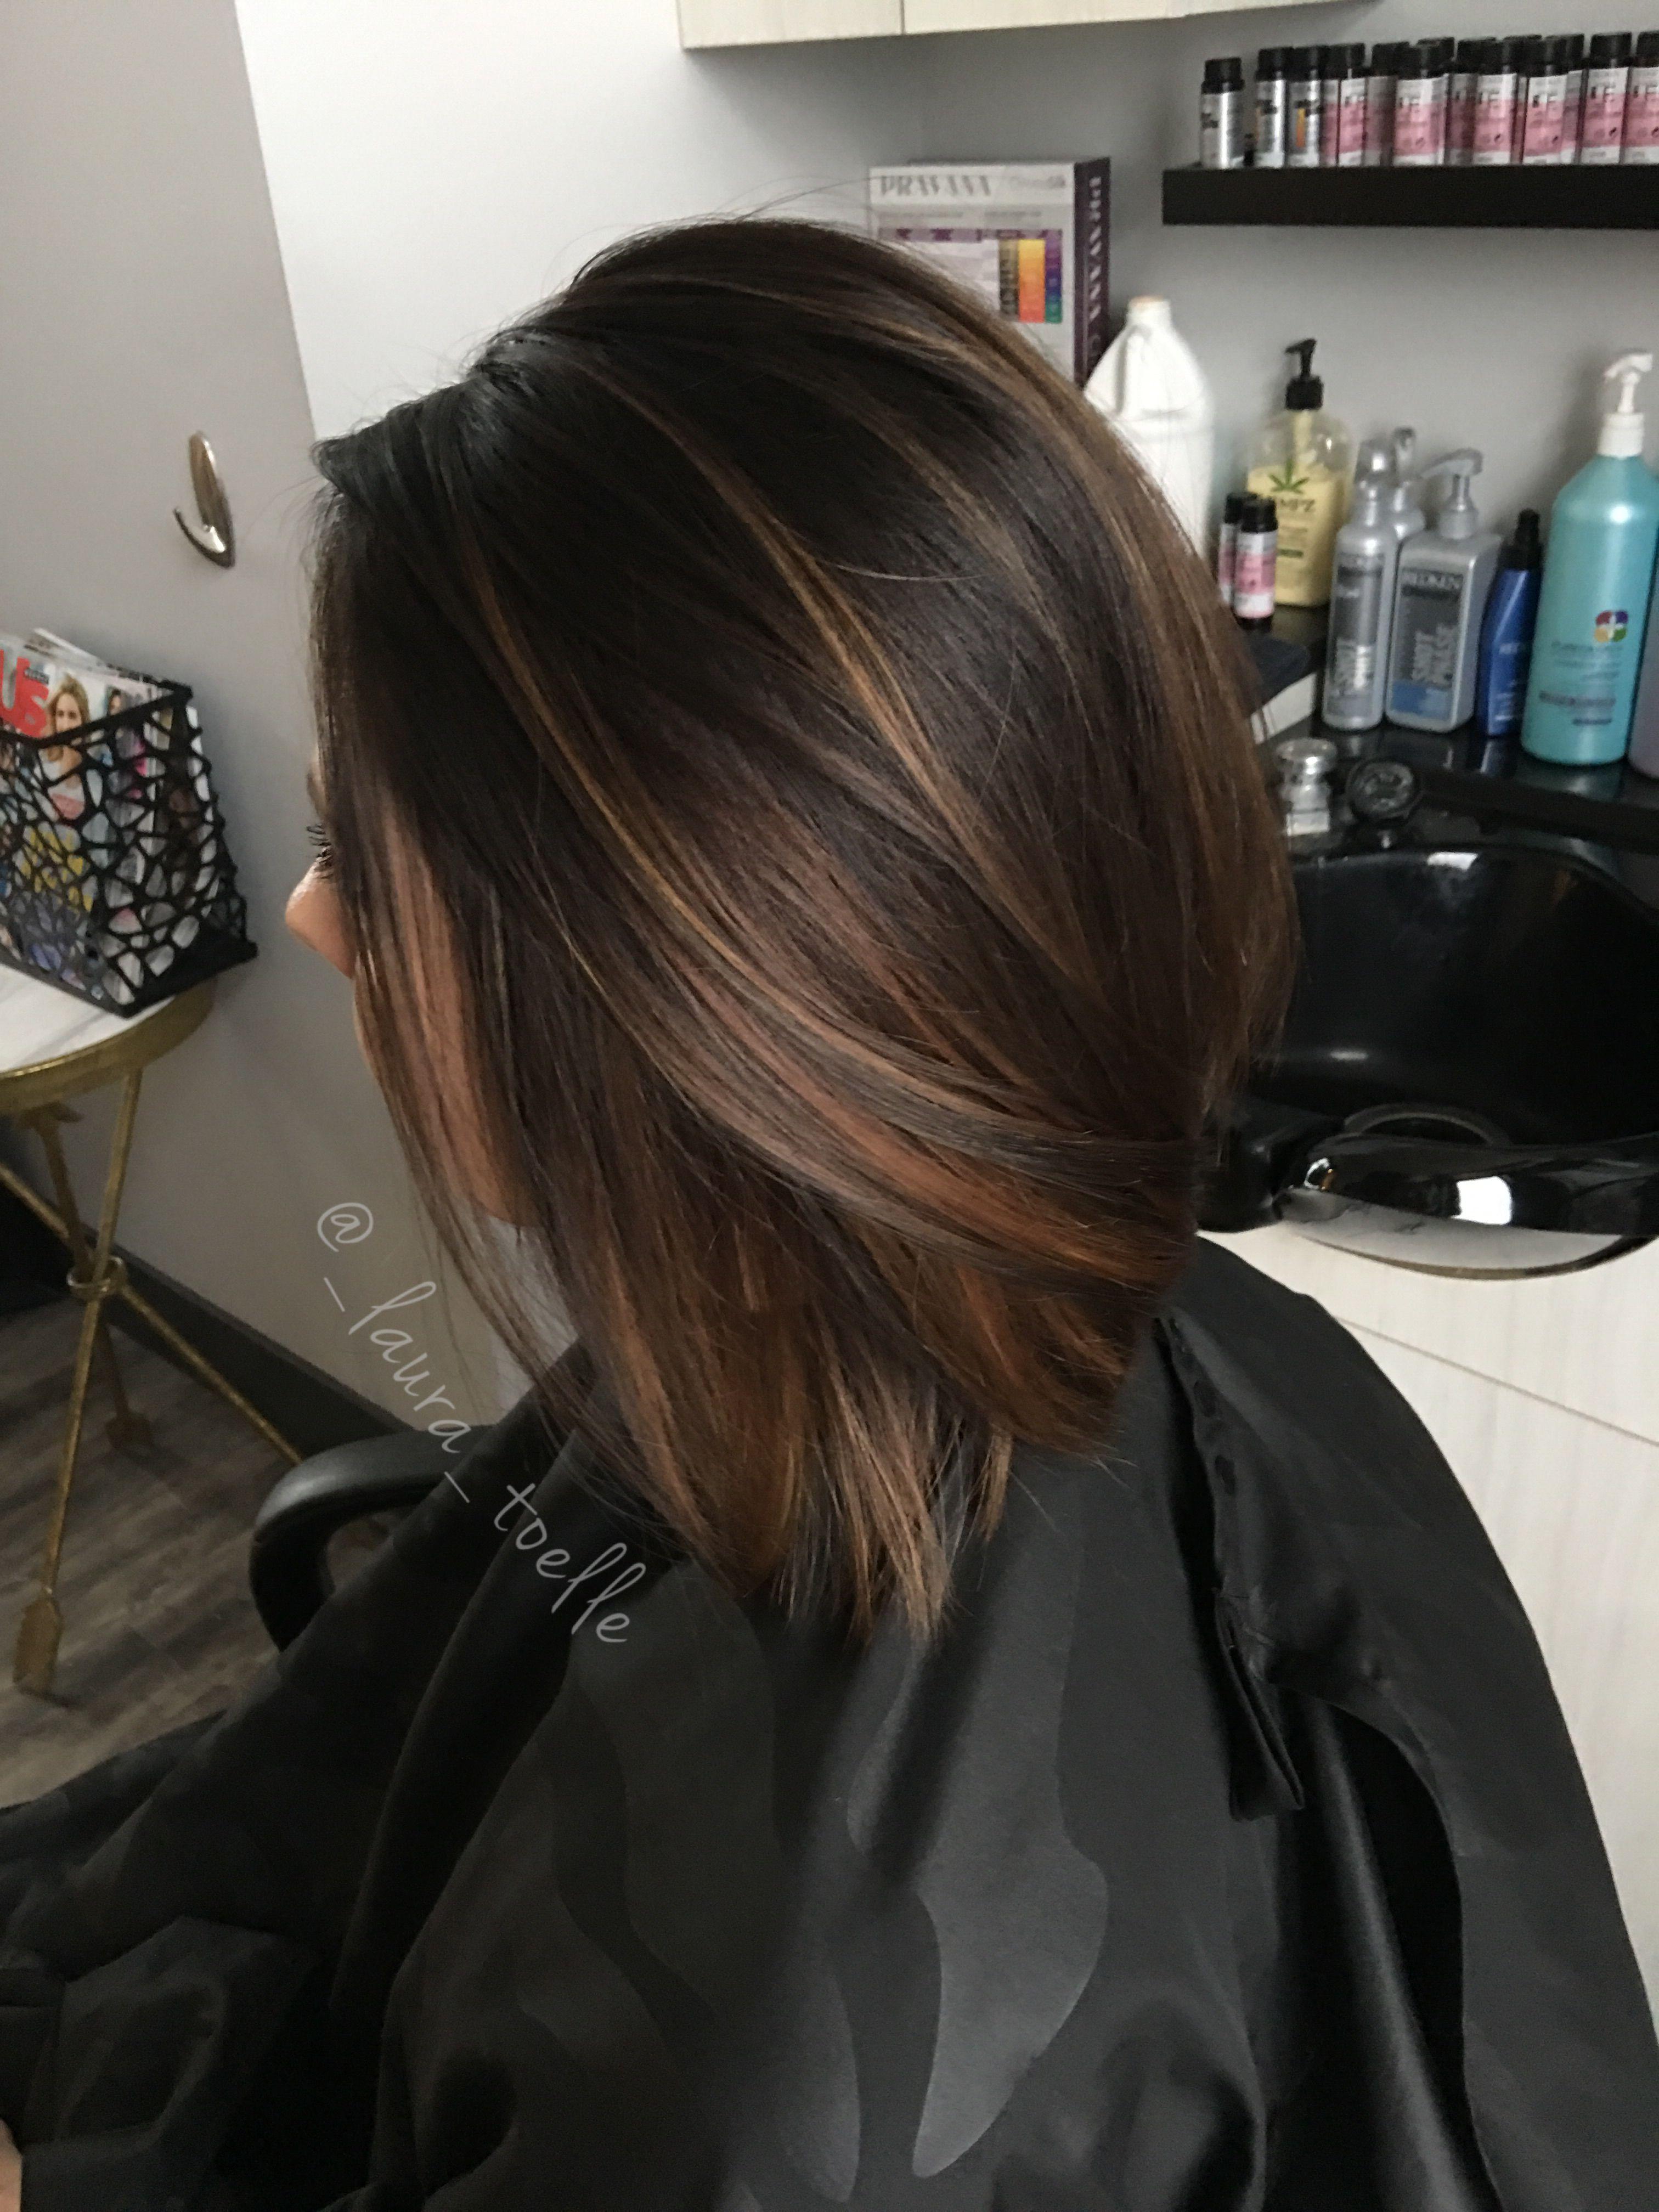 Caramel Highlights Dark Brown Hair Lkhairstudios Dyed Hair Brown Hair Styles Hair Highlights Long Hair Styles